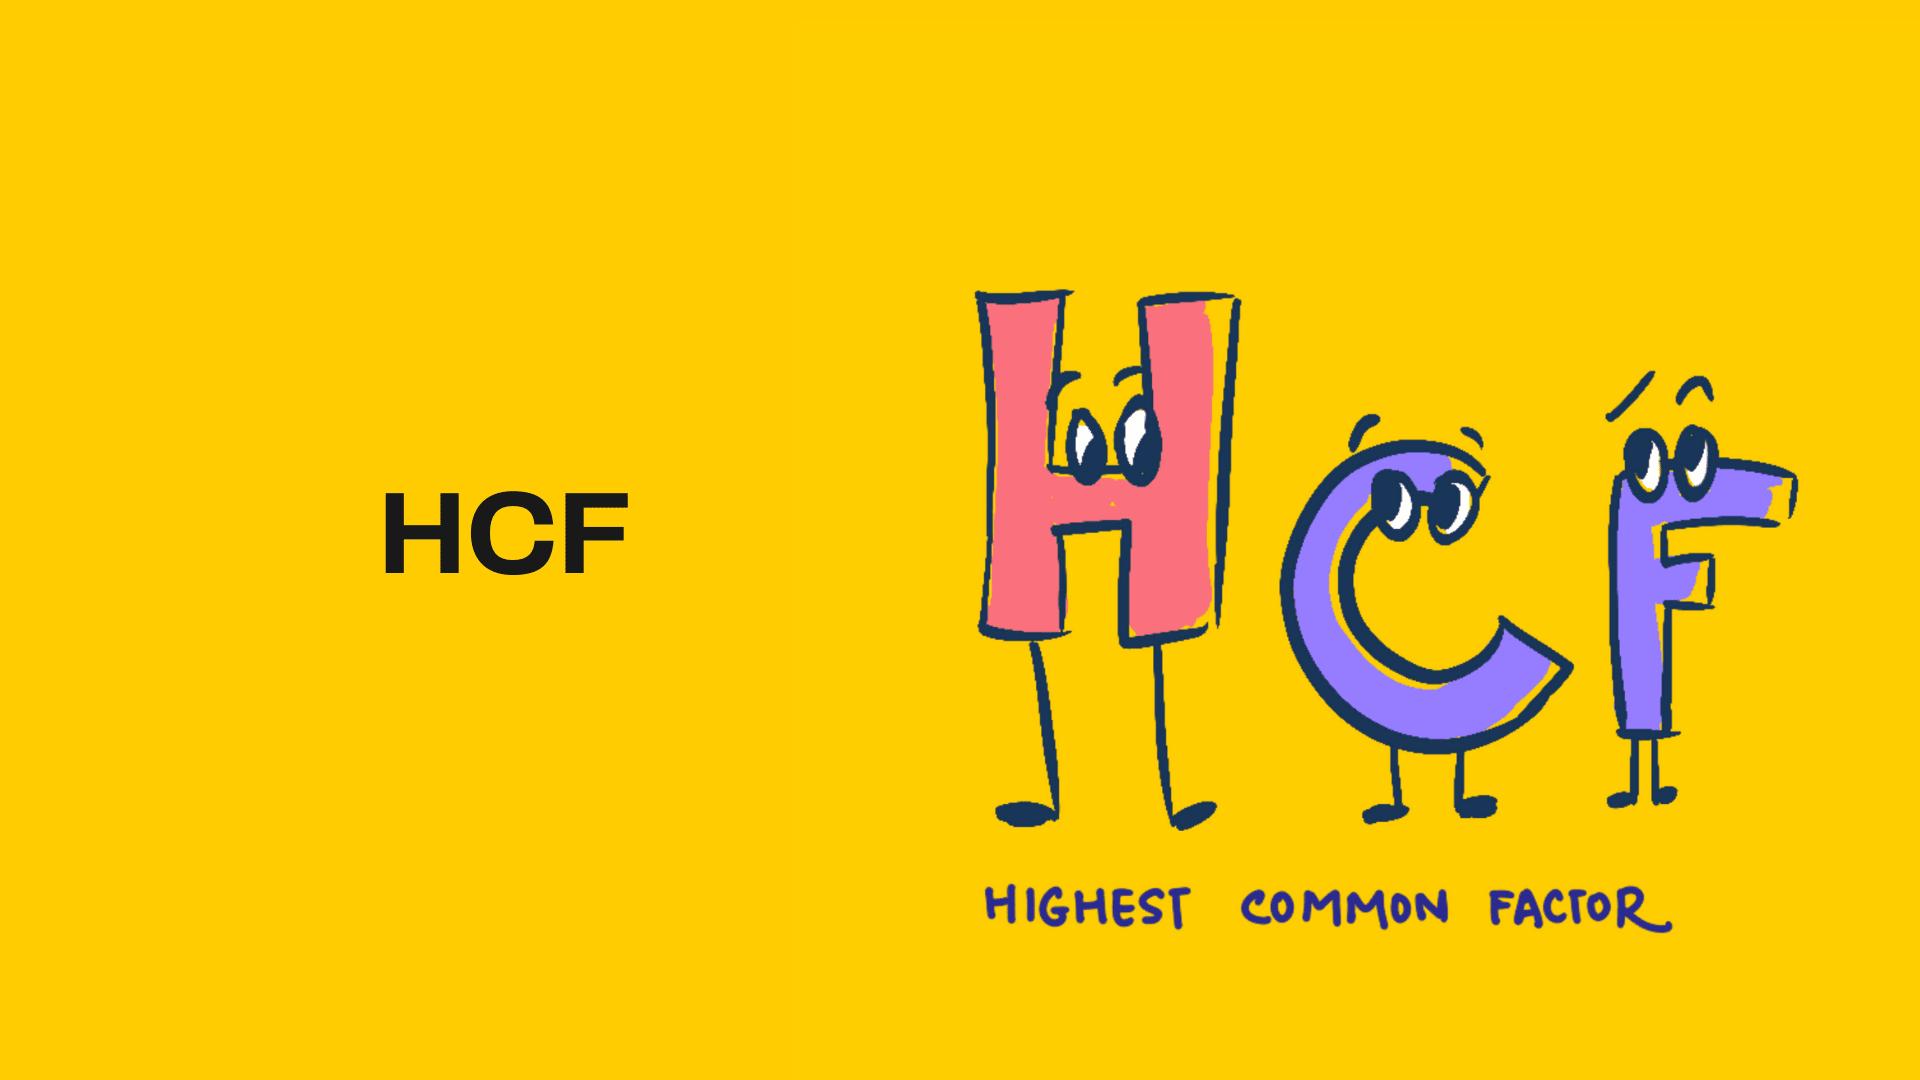 Hcf poster